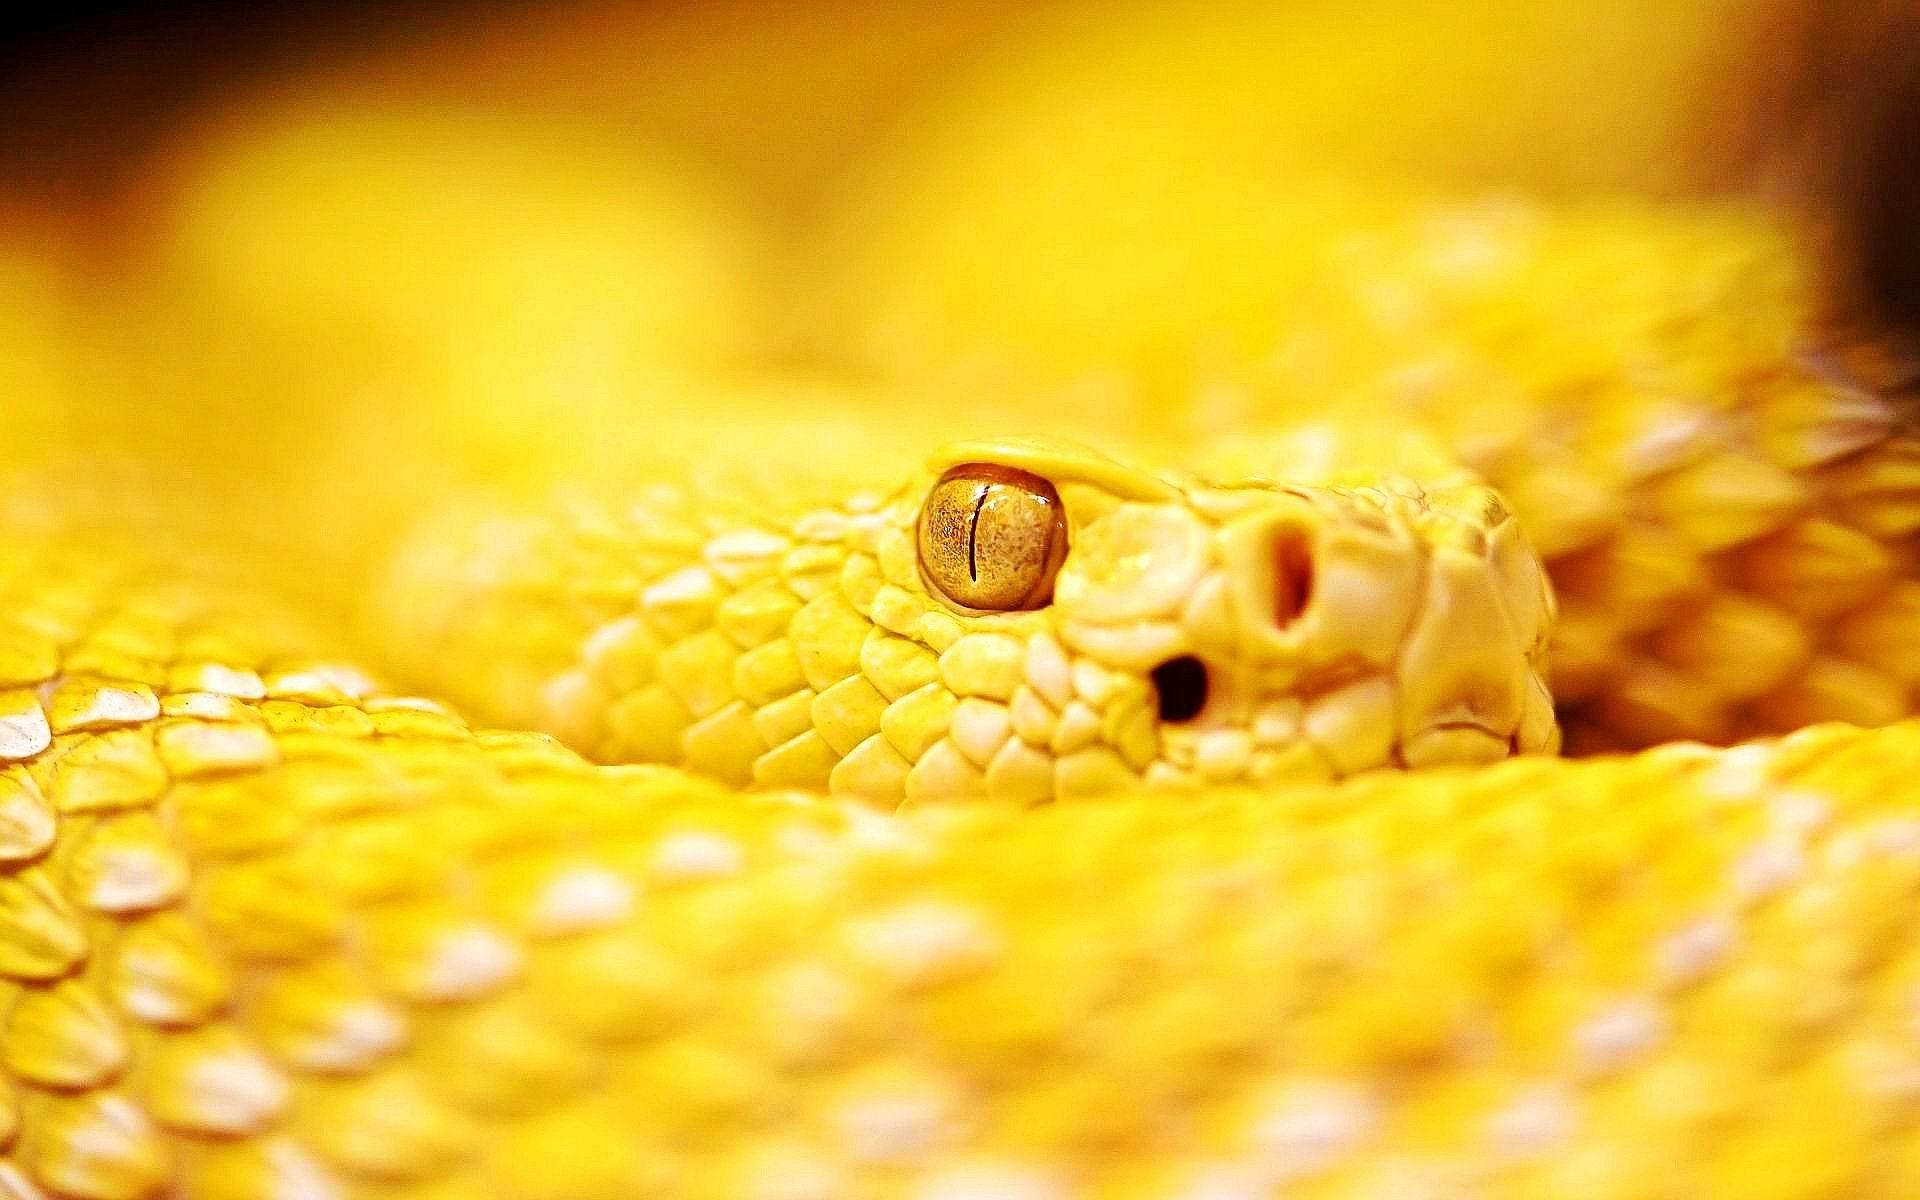 Download Albino Rattle Snake Wallpaper HD Wallpaper Animals 1920x1200